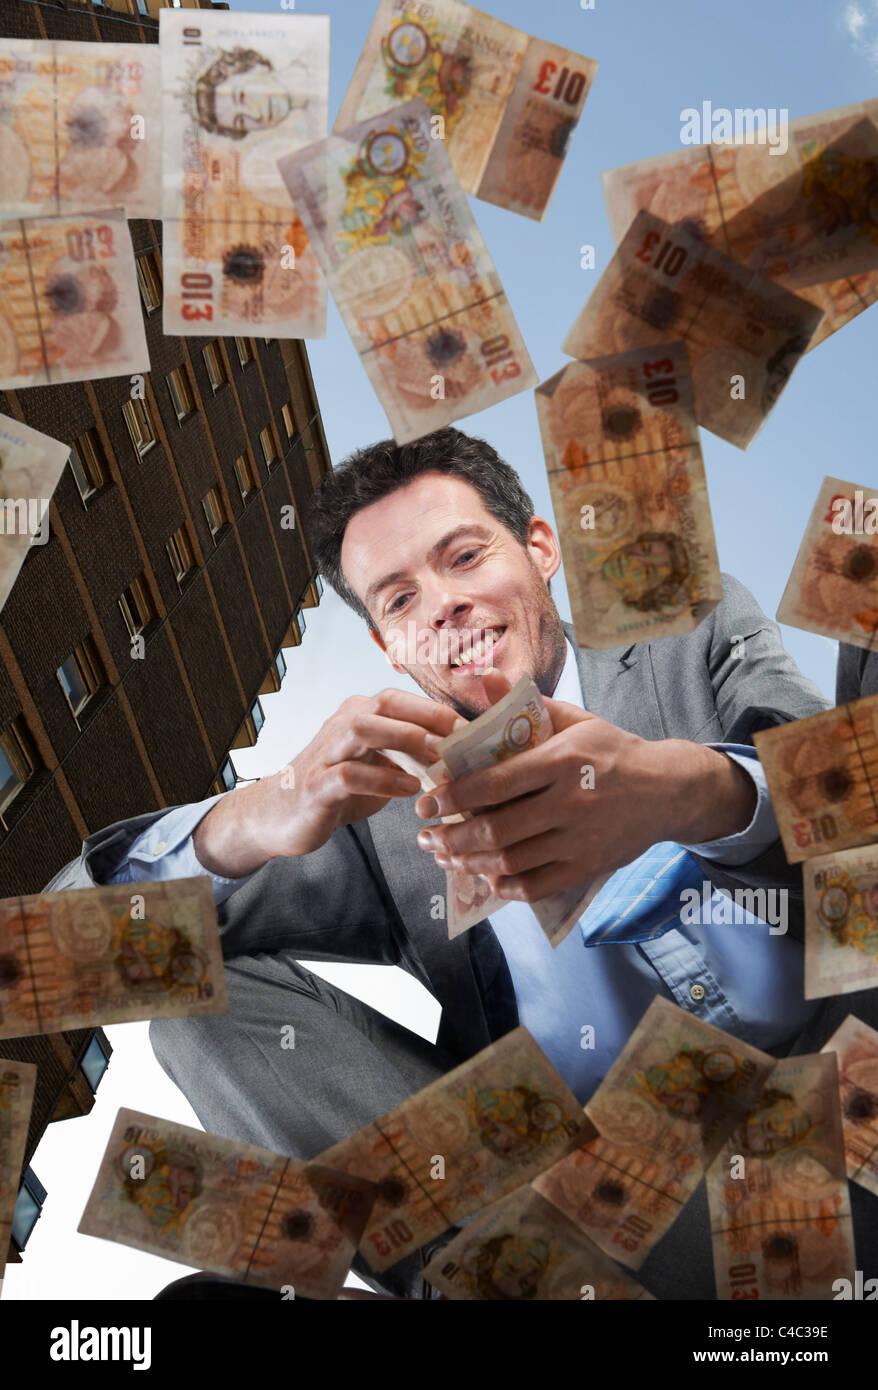 Businessman picking up discarded money - Stock Image